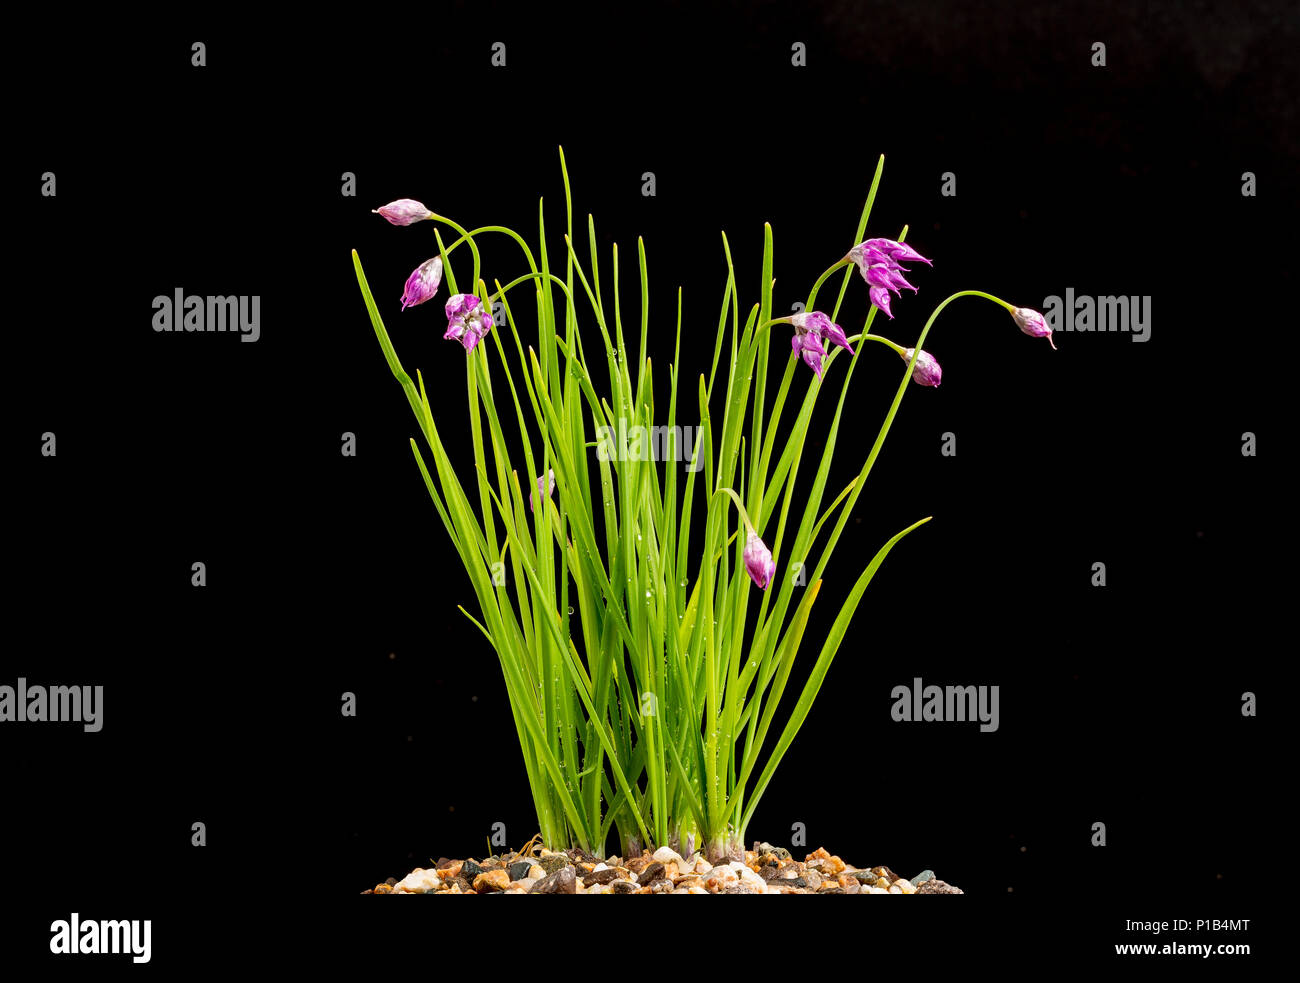 Allium cyathophorum var. farreri, flowering June 3, 2018 Stock Photo